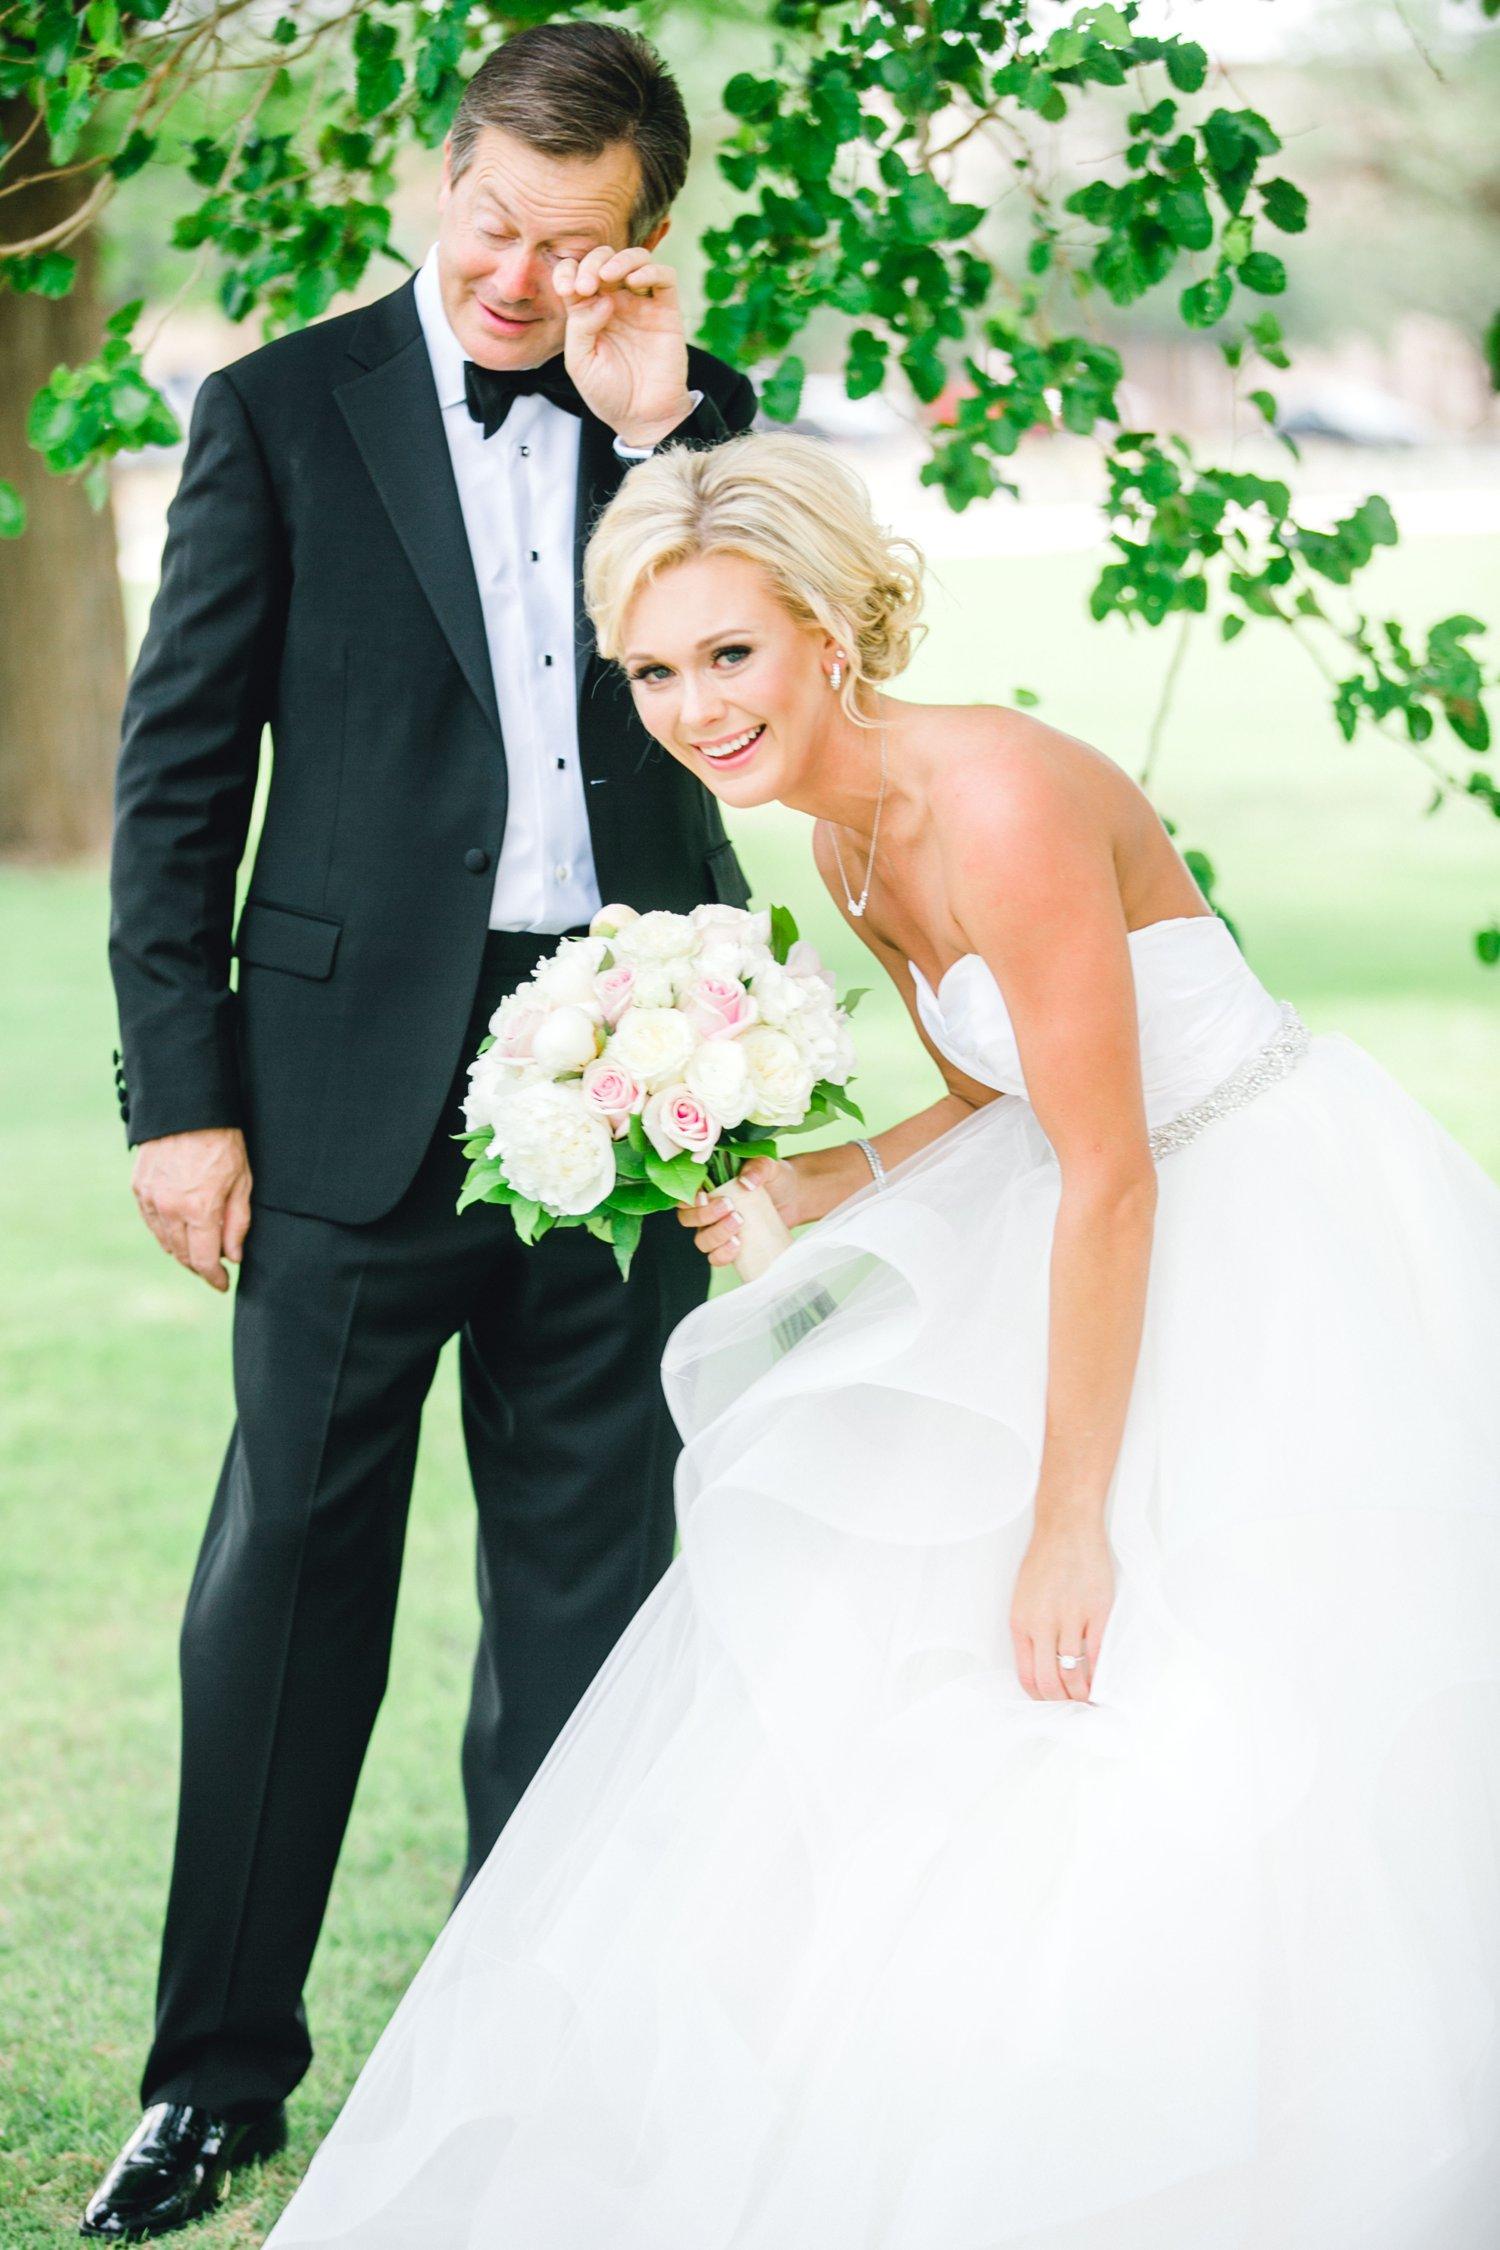 Taylor-and-Brock-Williams-Texas-Tech-University-Merket-Alumni-Center-Lubbock-Photographer-ALLEEJ0020.jpg